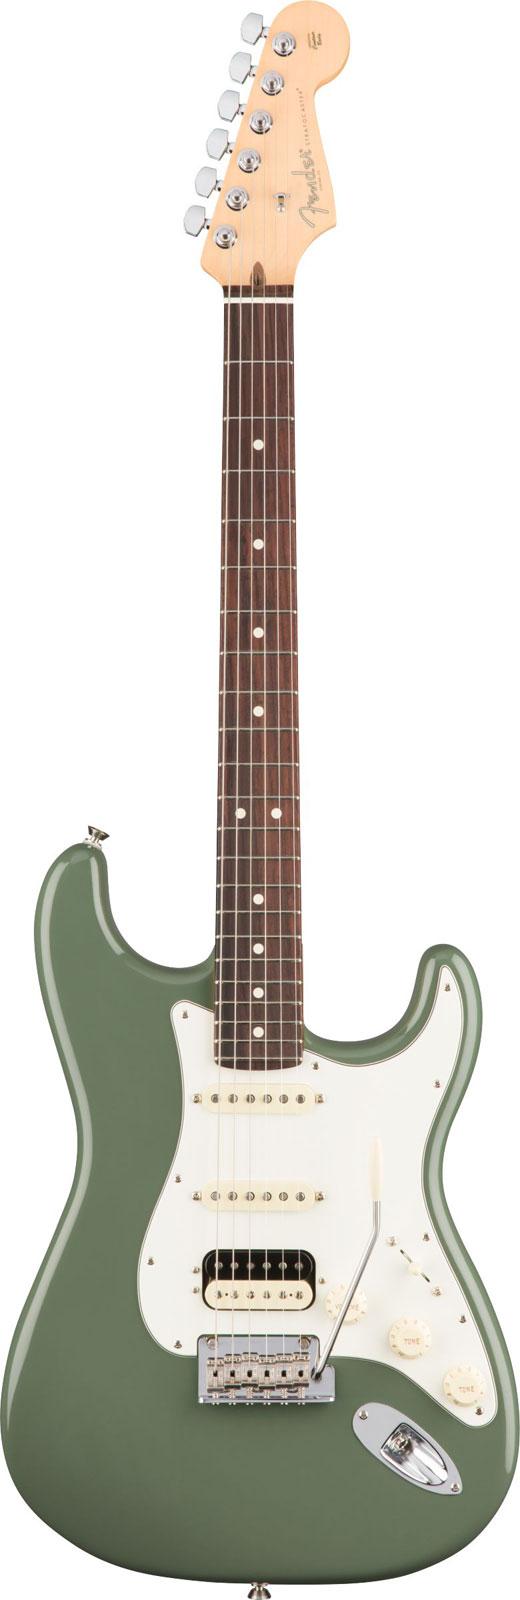 Fender American Professional Stratocaster Hss Shawbucker Rw Antique Olive